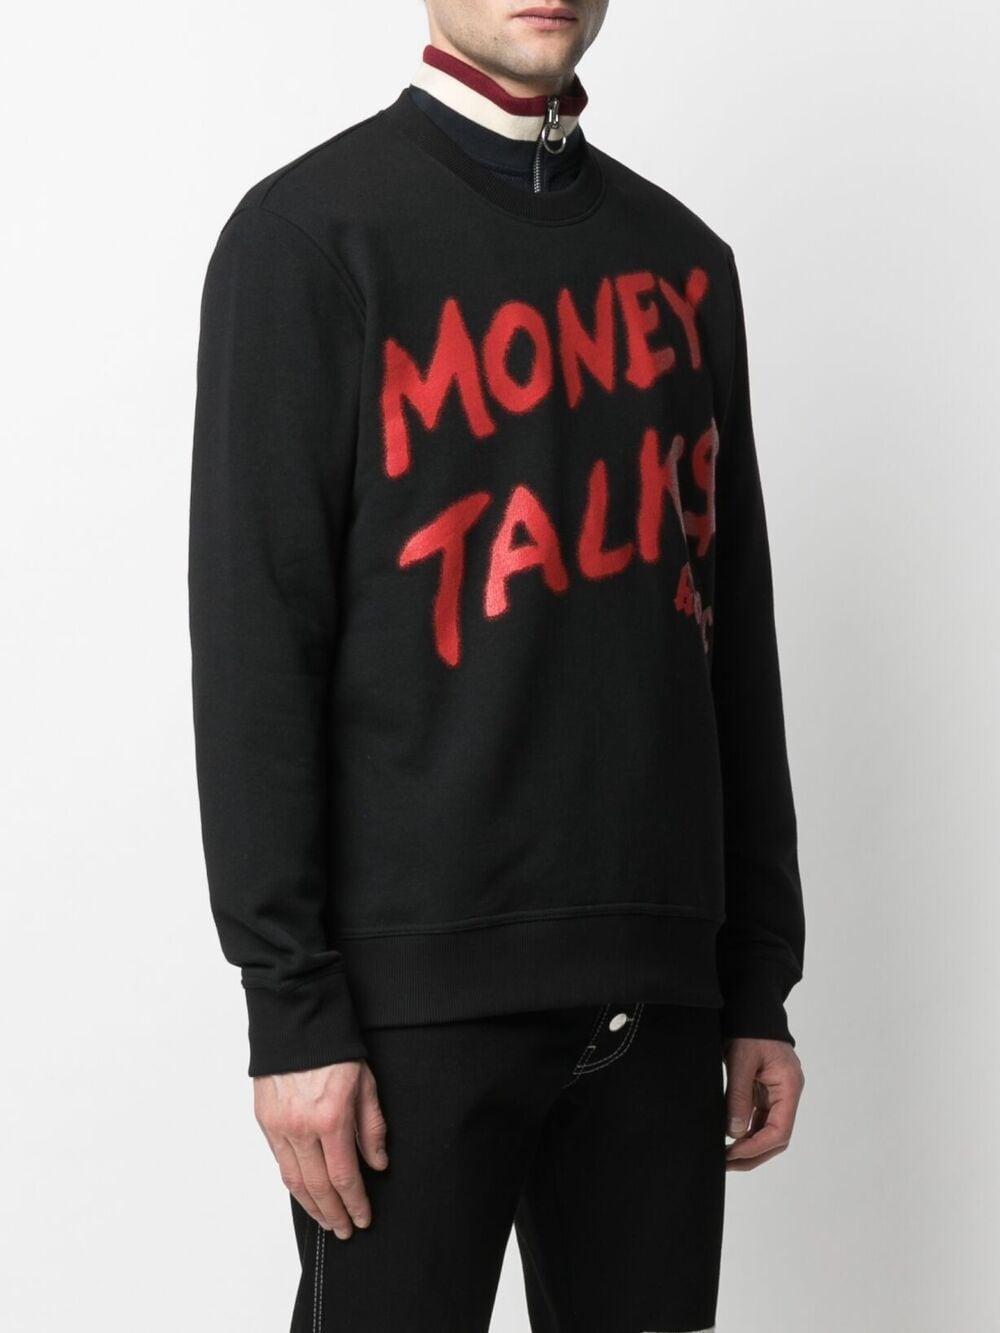 Picture of Ih Nom Uh Nit | Money Talks Sweatshirt